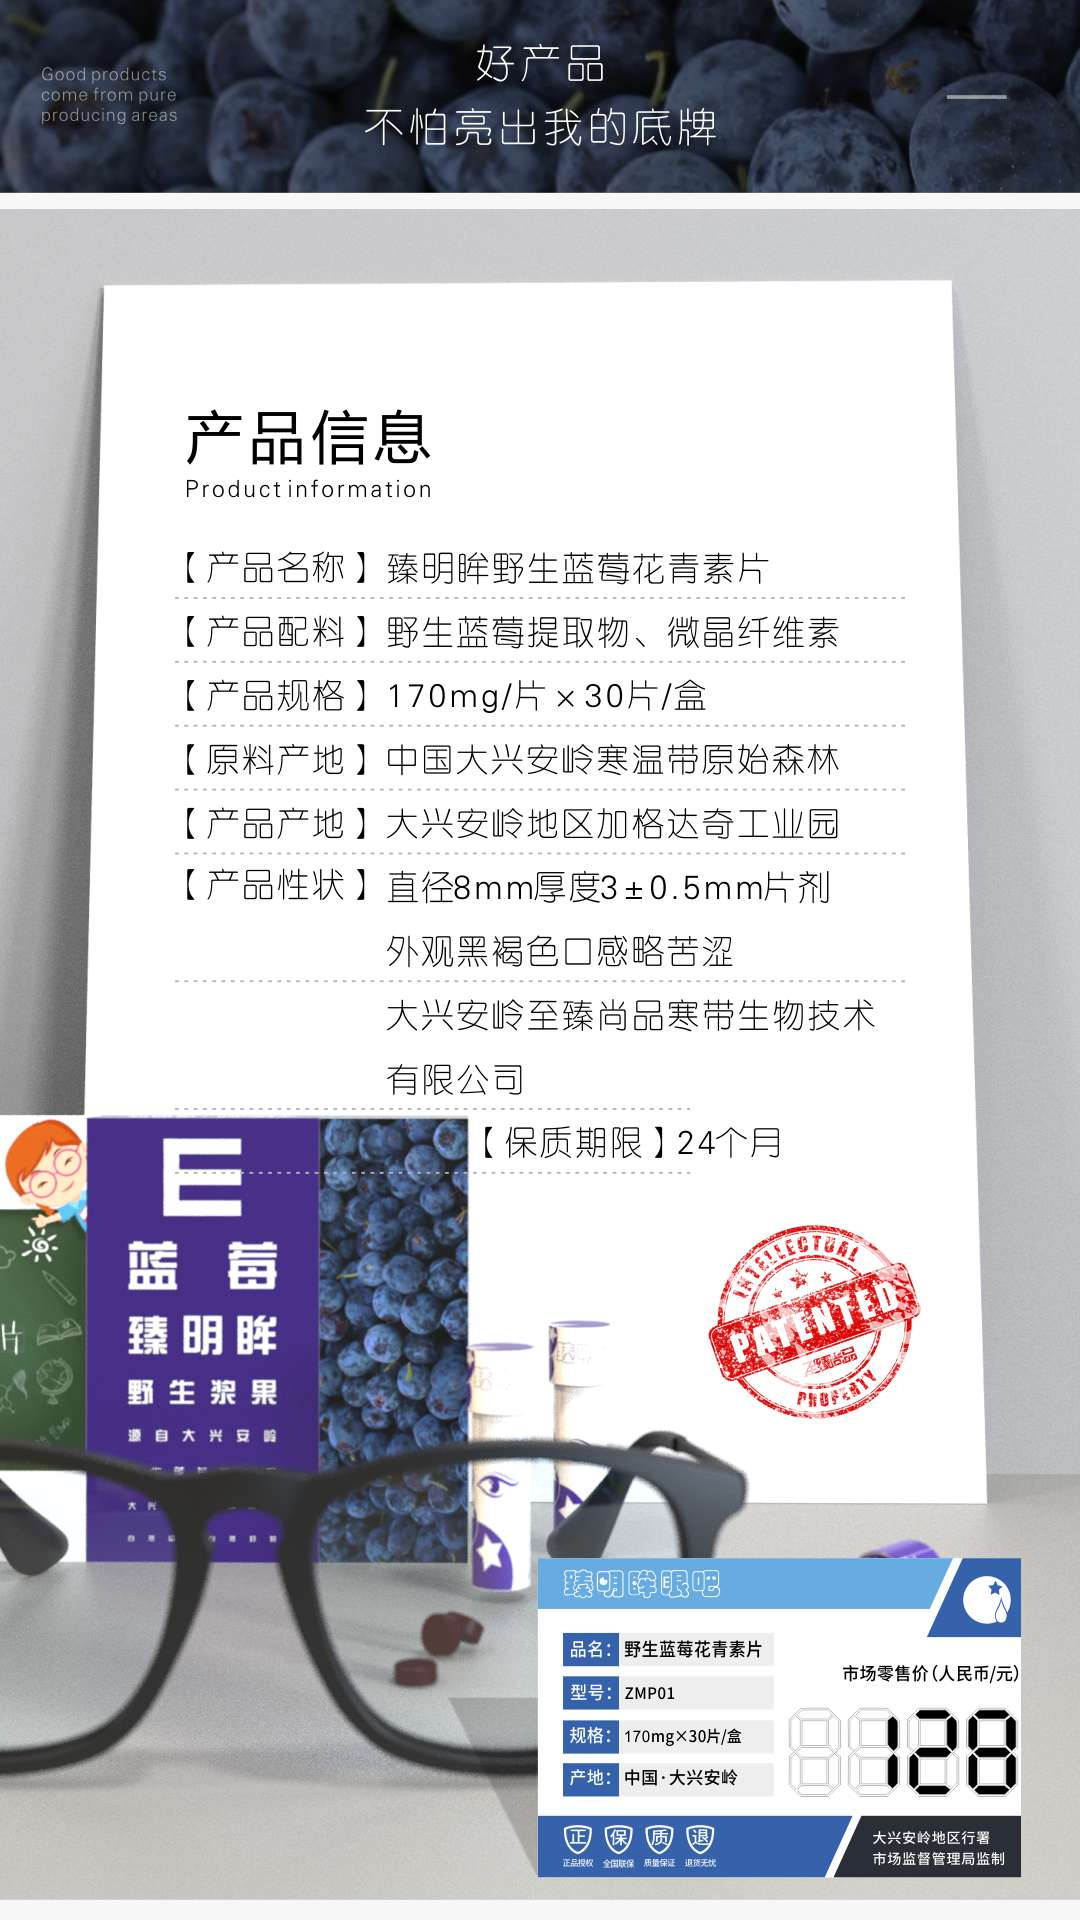 Z 至臻尚品-臻明眸藍莓花青素片-14.jpg